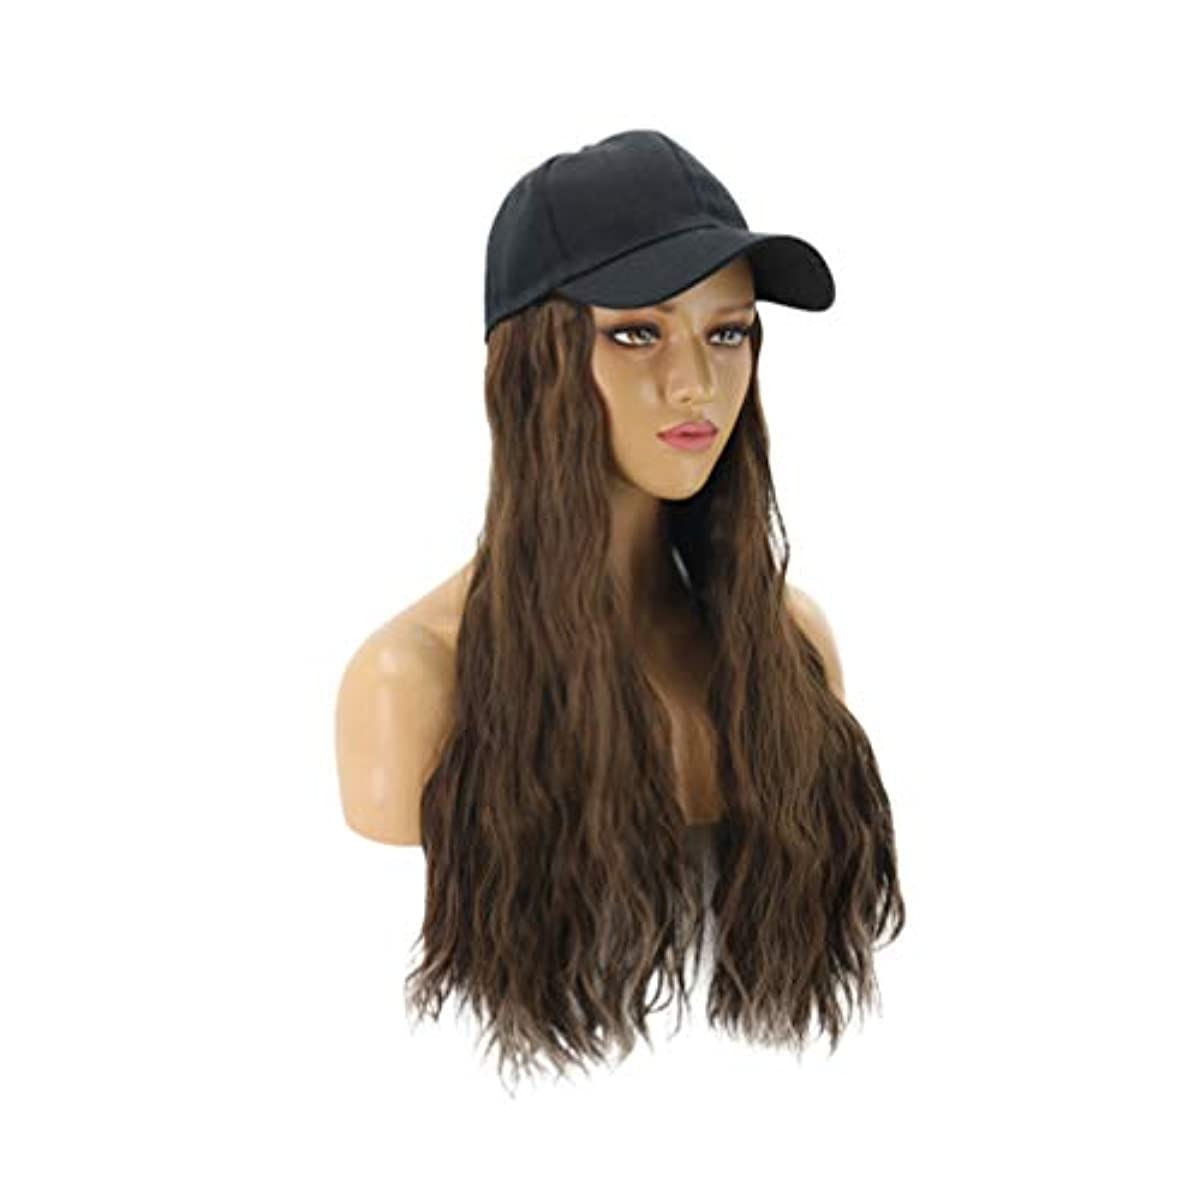 アーティストアーティストアーティストMinkissy 女性の髪のかつらキャップワンピースコーンホット髪かつら帽子ファッションキャップ付きのエレガントなヘアピース帽子とファッショナブルな髪の拡張子(ライトブラウン)